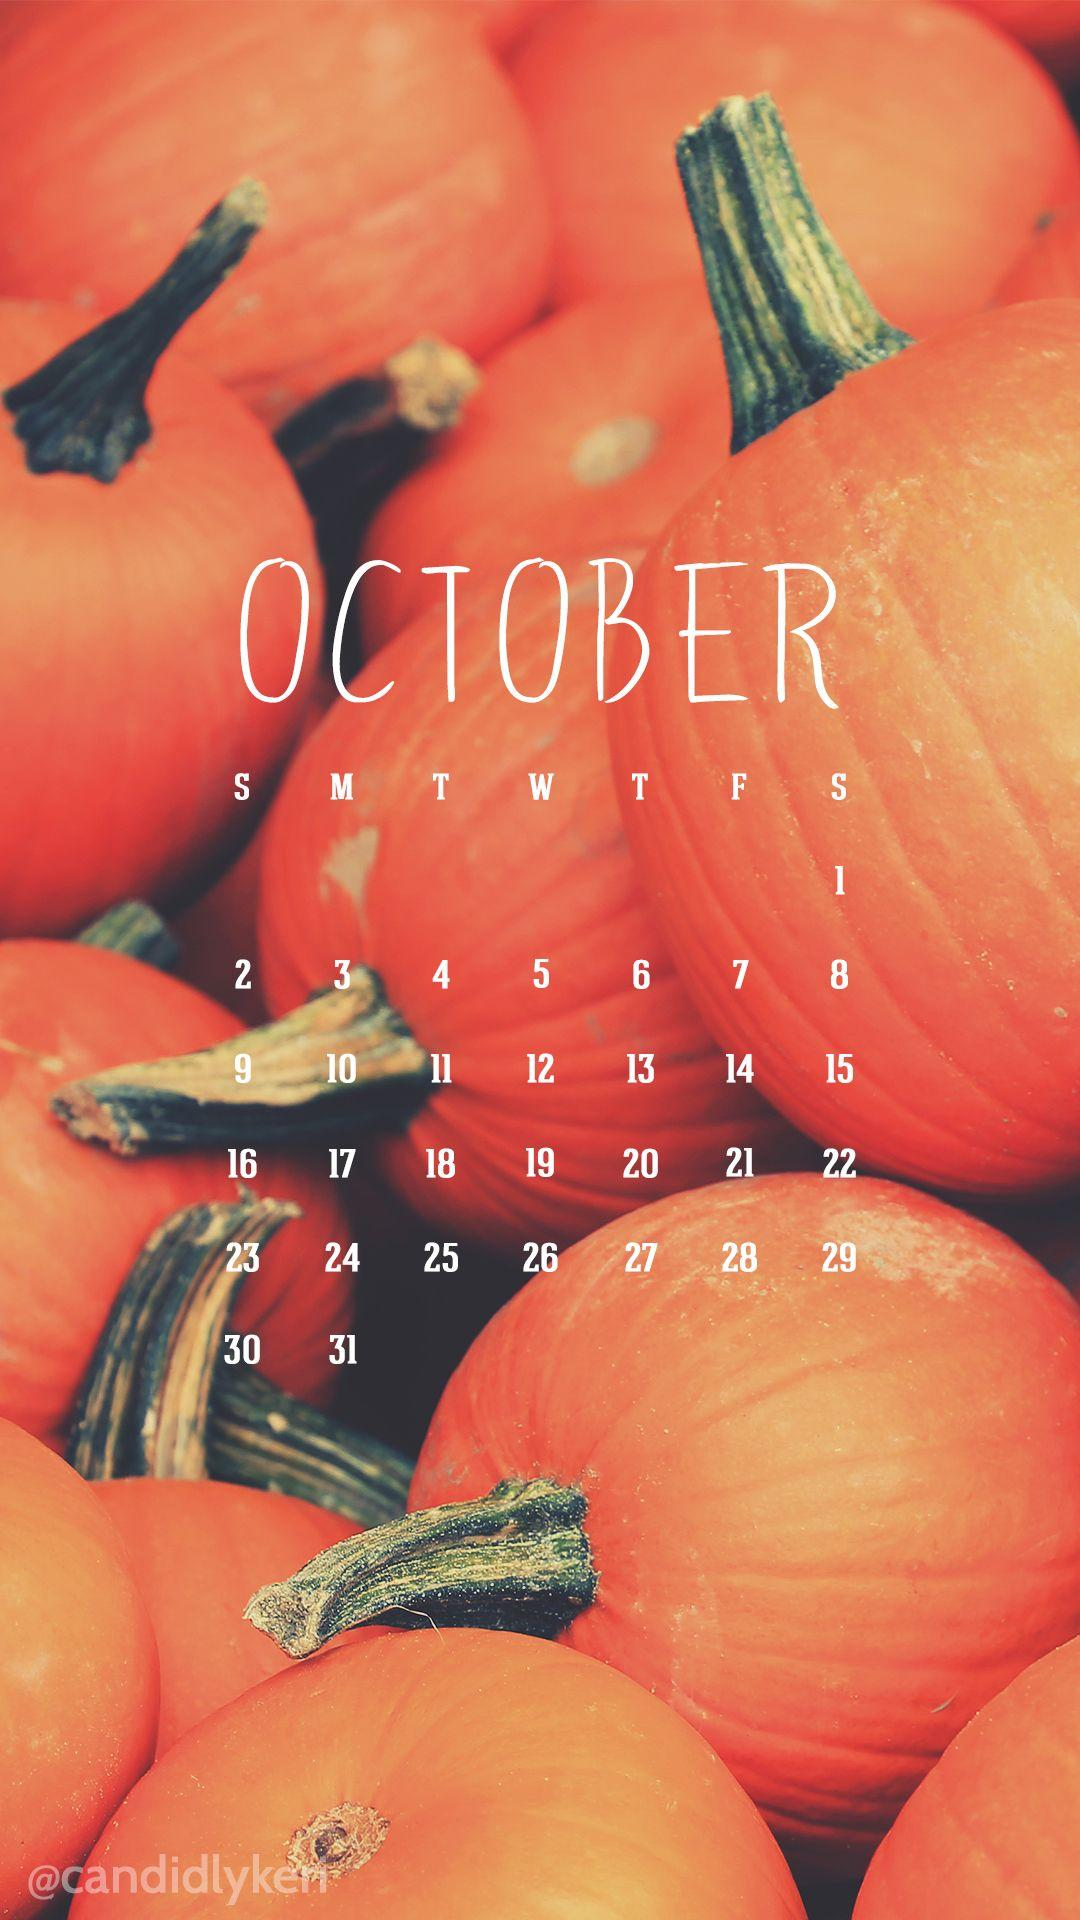 Fall Themed Iphone 6 Wallpaper Pumpkin Patch Wallpapers Wallpaper Cave